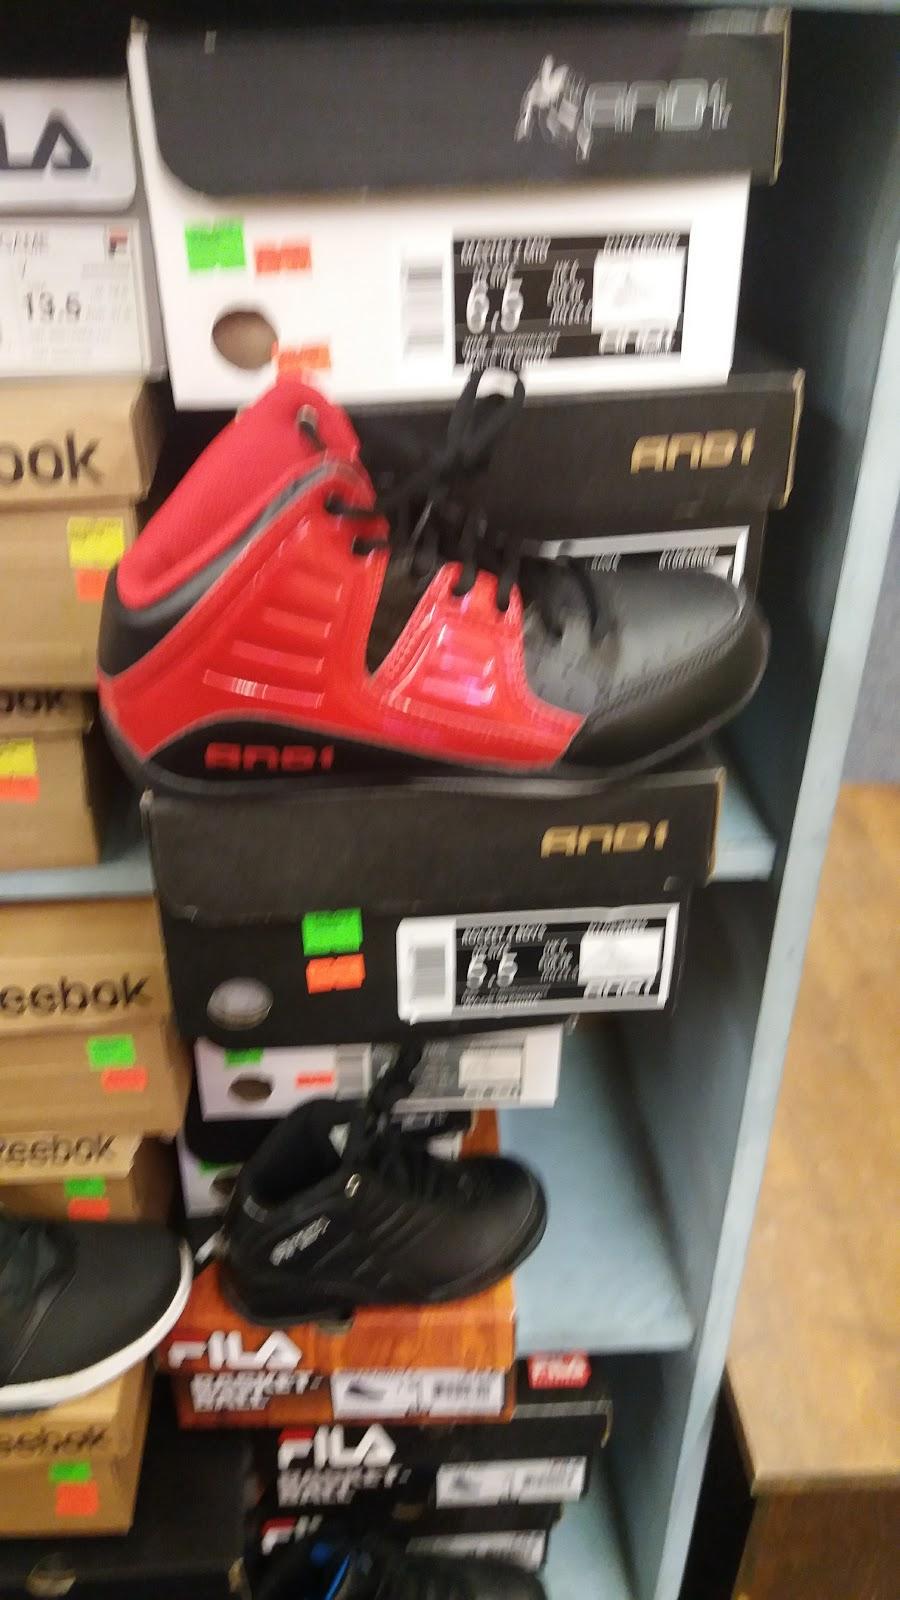 Rogans Shoes - shoe store  | Photo 8 of 10 | Address: 649 S Taylor Dr, Sheboygan, WI 53081, USA | Phone: (920) 451-0188